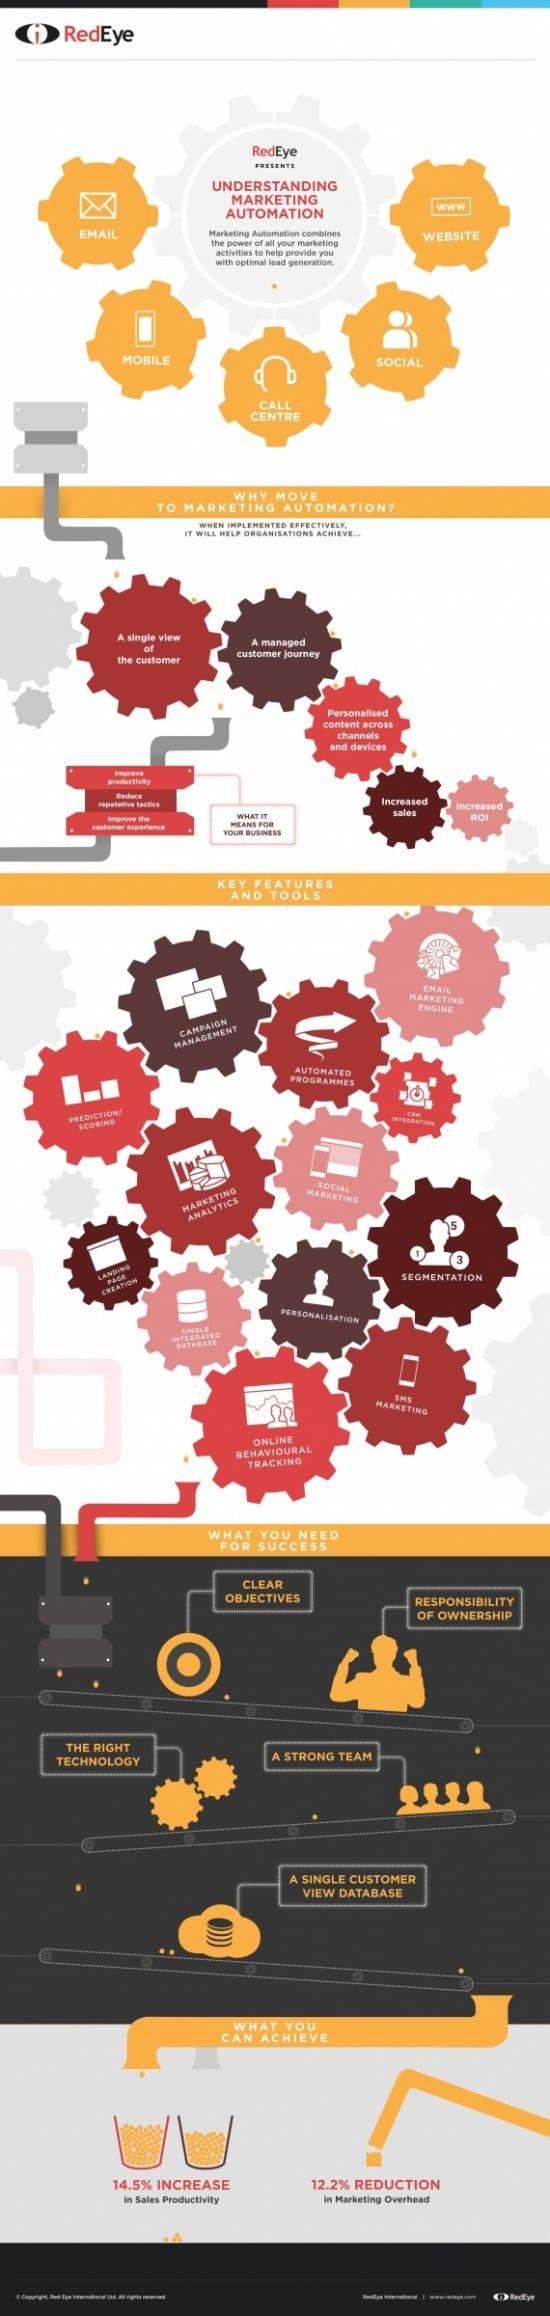 redeyeMarketing-Automation-Infographic